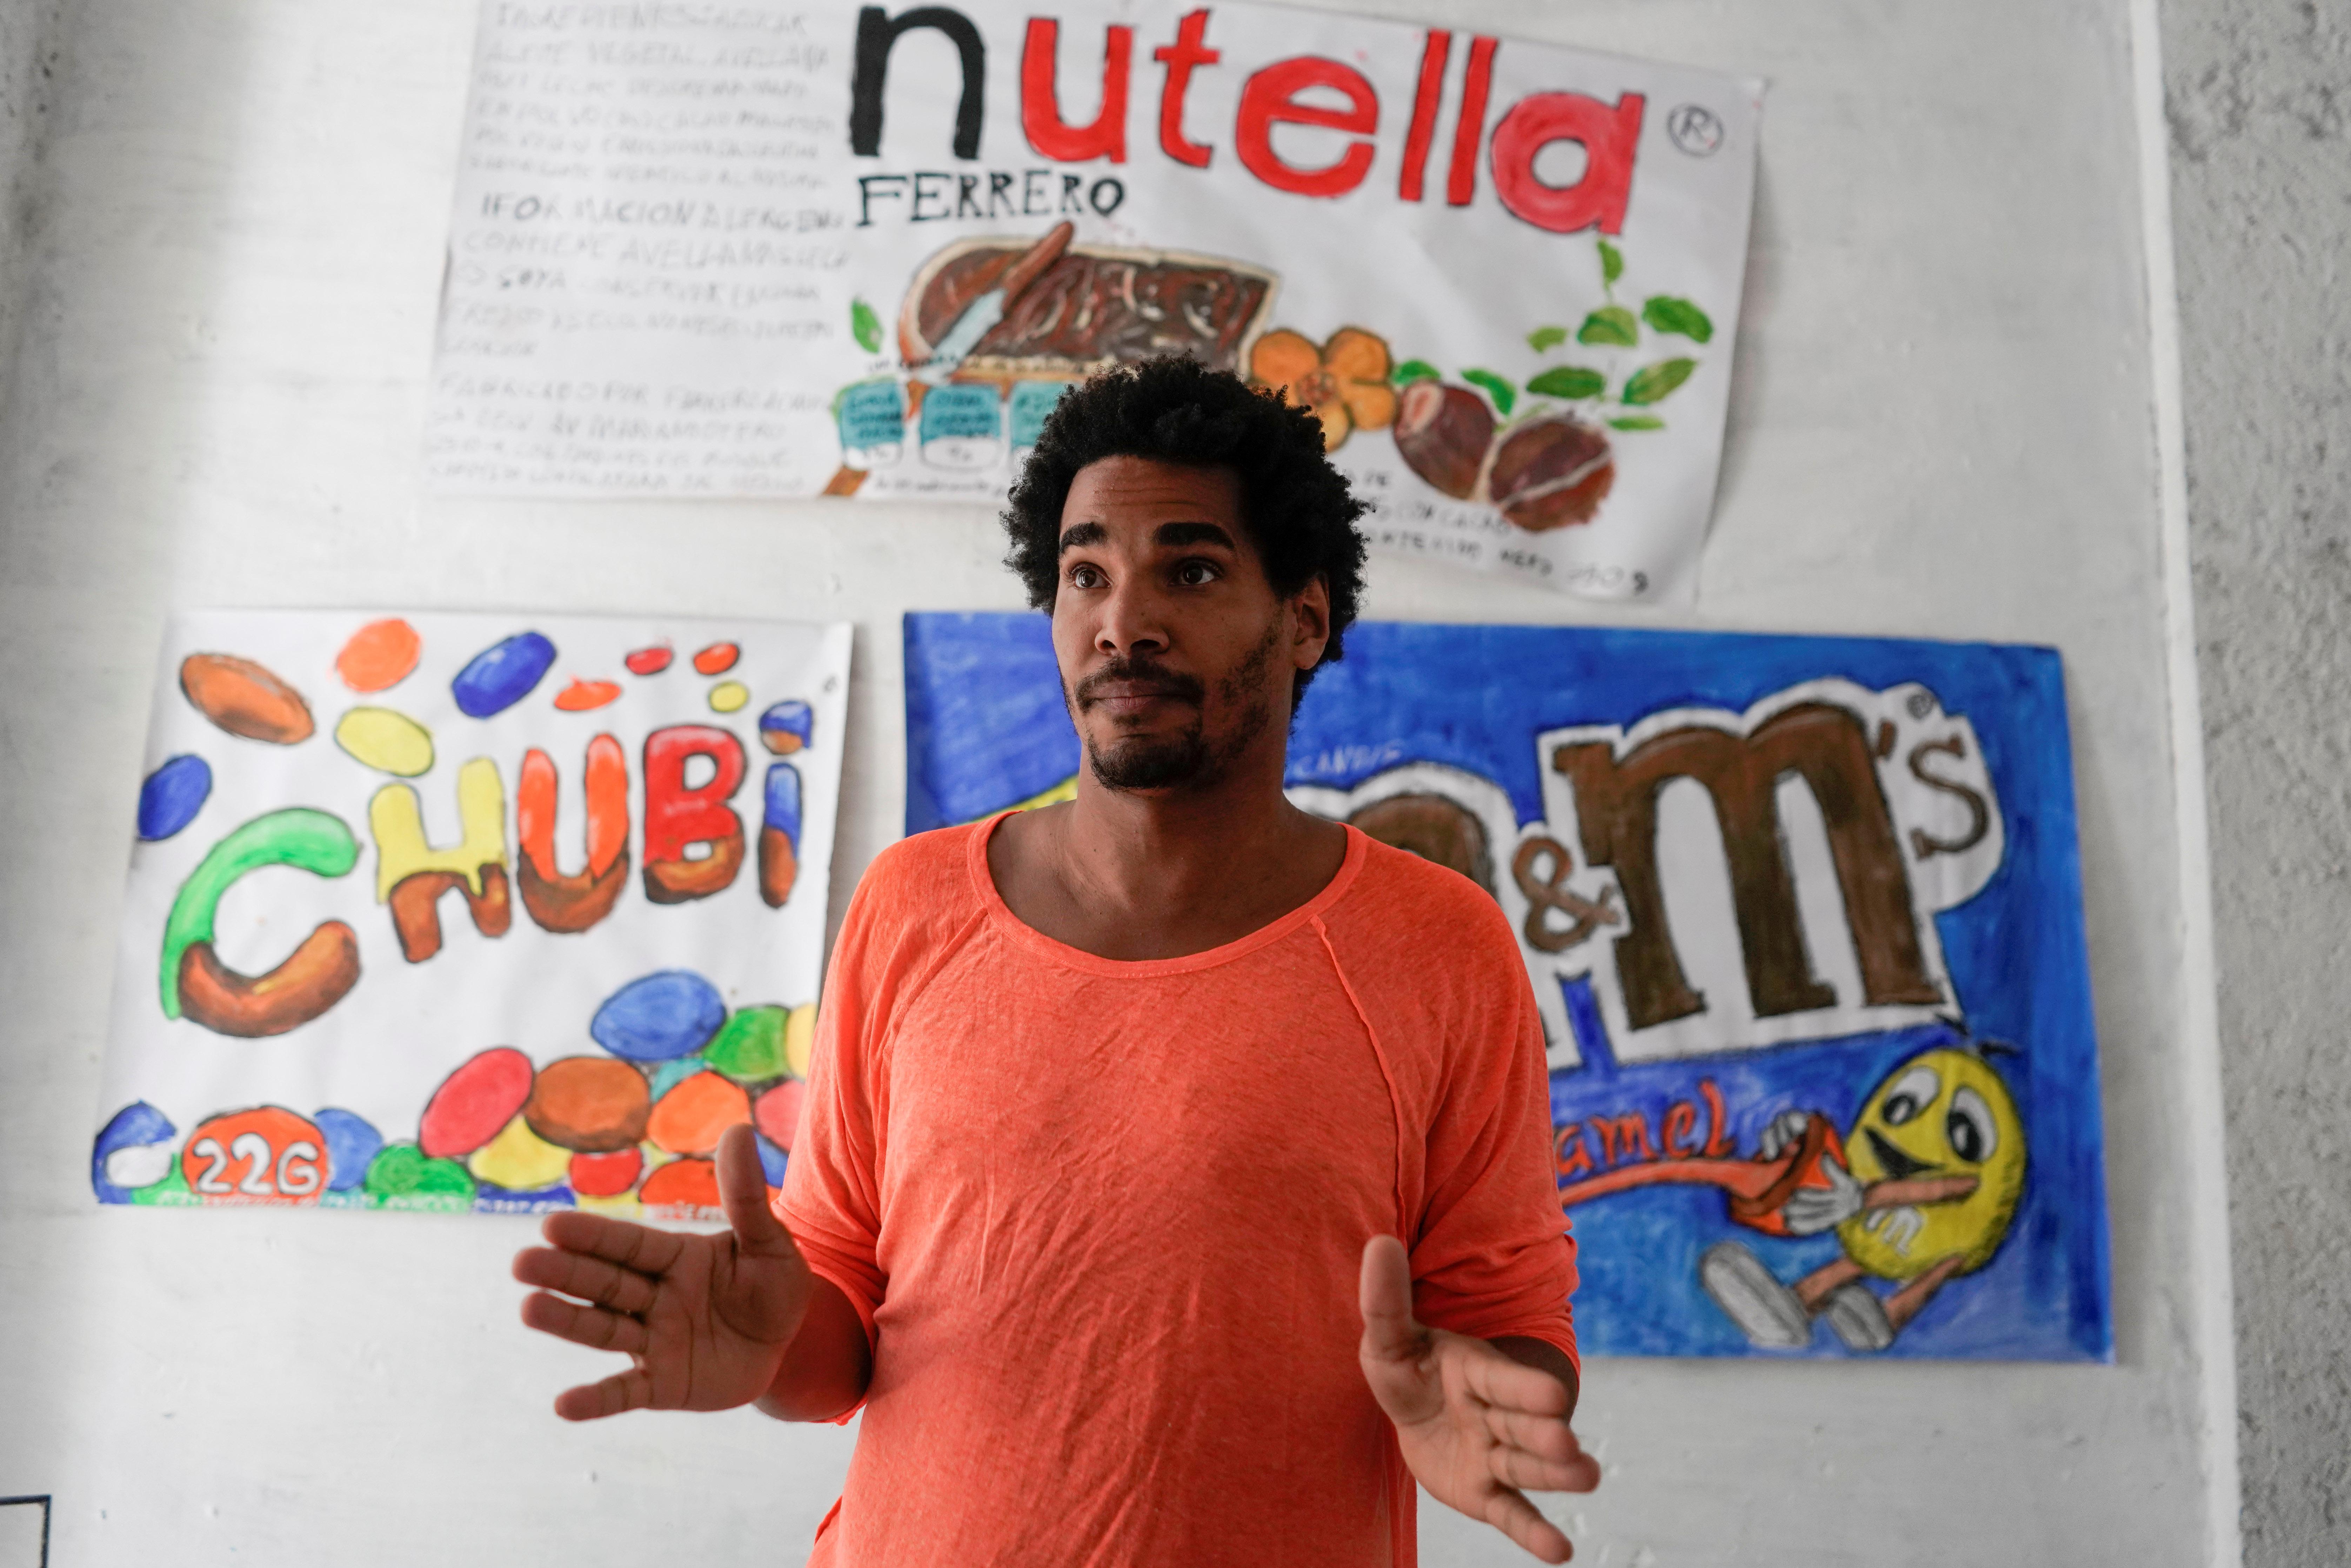 Dissident artist Luis Manuel Otero Alcantara speaks during an interview at the headquarters of San Isidro Movement in Havana, Cuba, April 6, 2021. REUTERS/Alexandre Meneghini